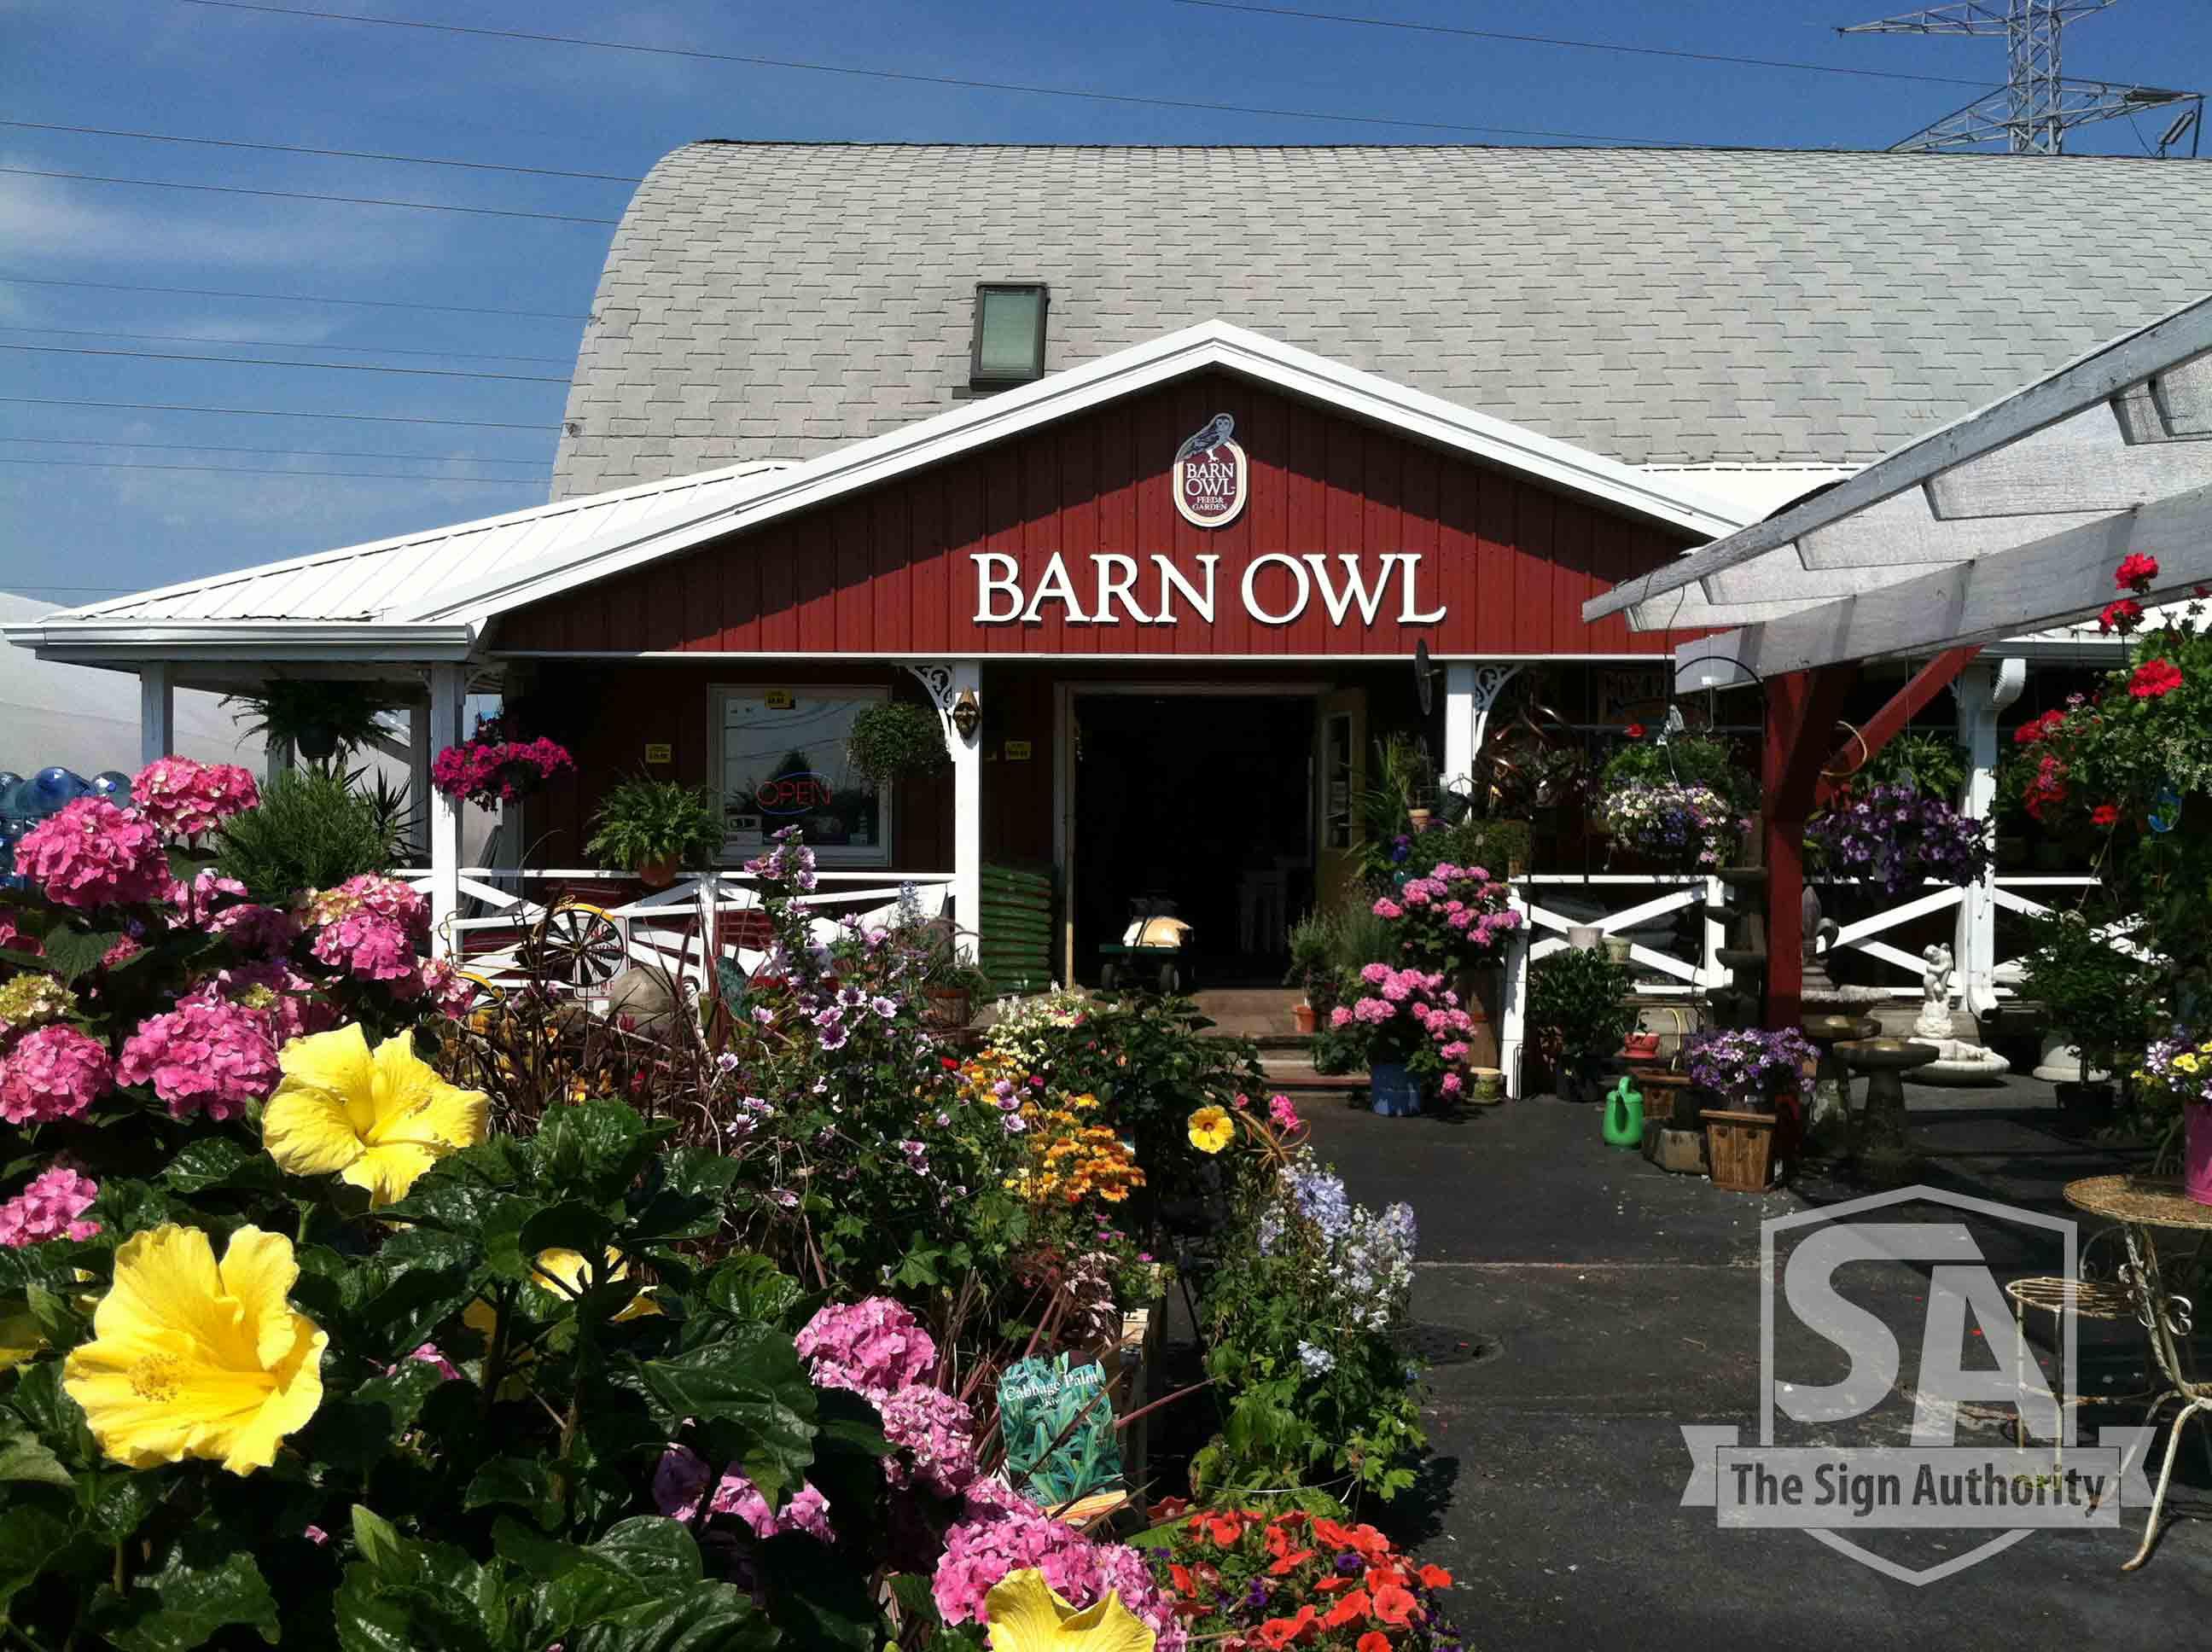 Custom Large Building Signs for Barn Owl in Carol Stream, IL